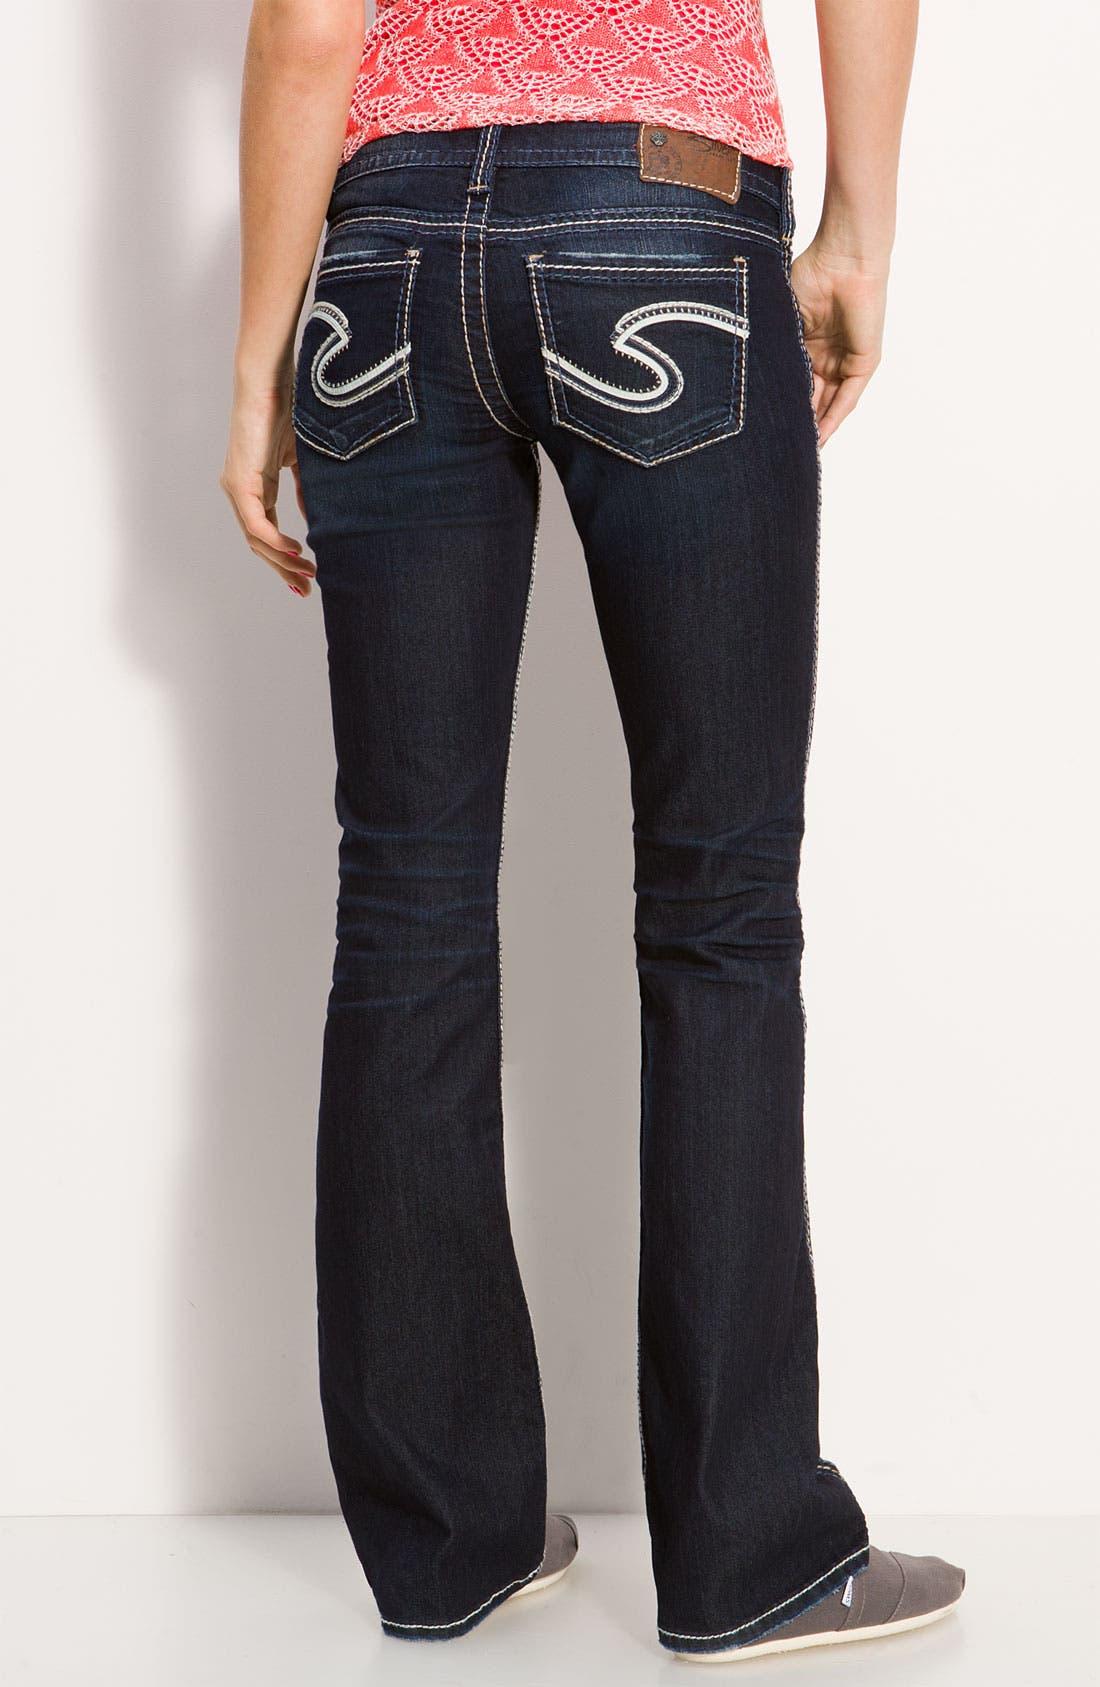 Main Image - Silver Jeans Co. 'Frances' Bootcut Jeans (Indigo Wash) (Juniors Regular & Long)